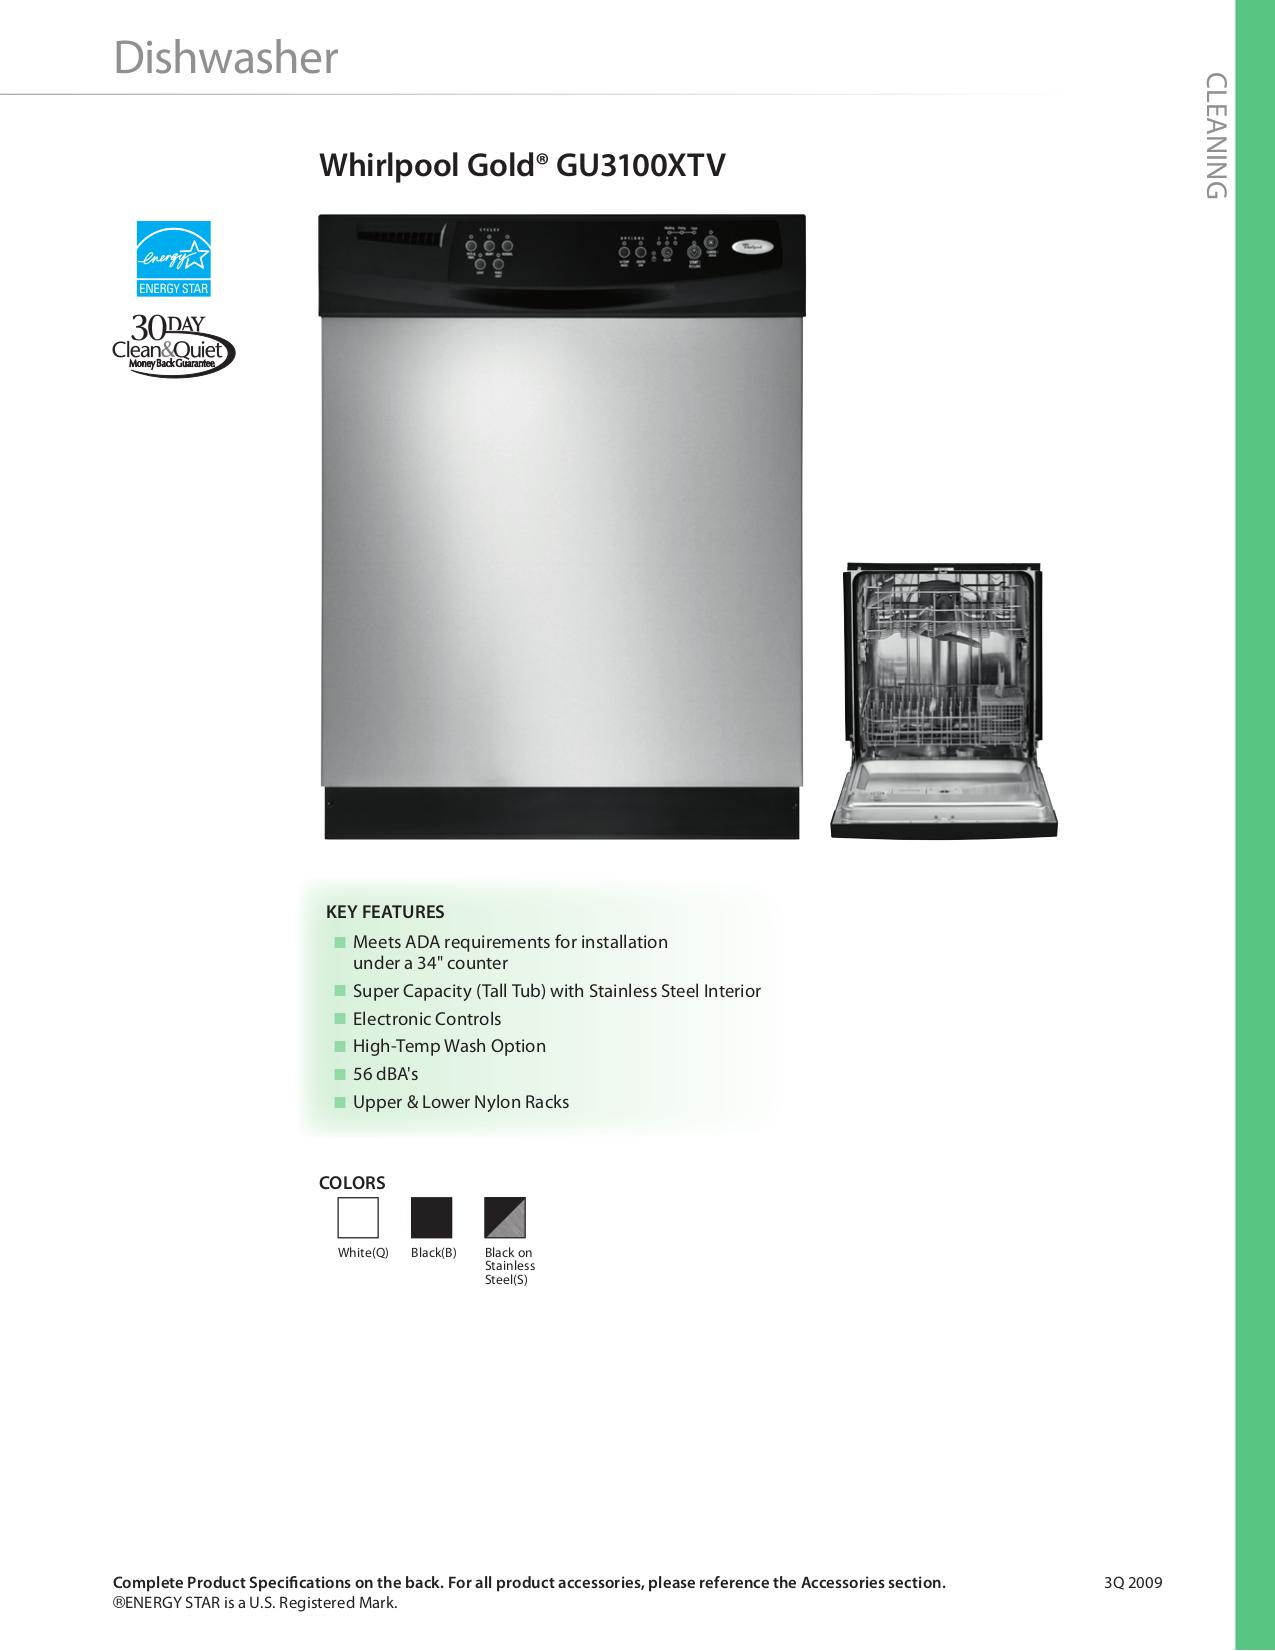 pdf for Whirlpool Dishwasher GU3100VXTB manual